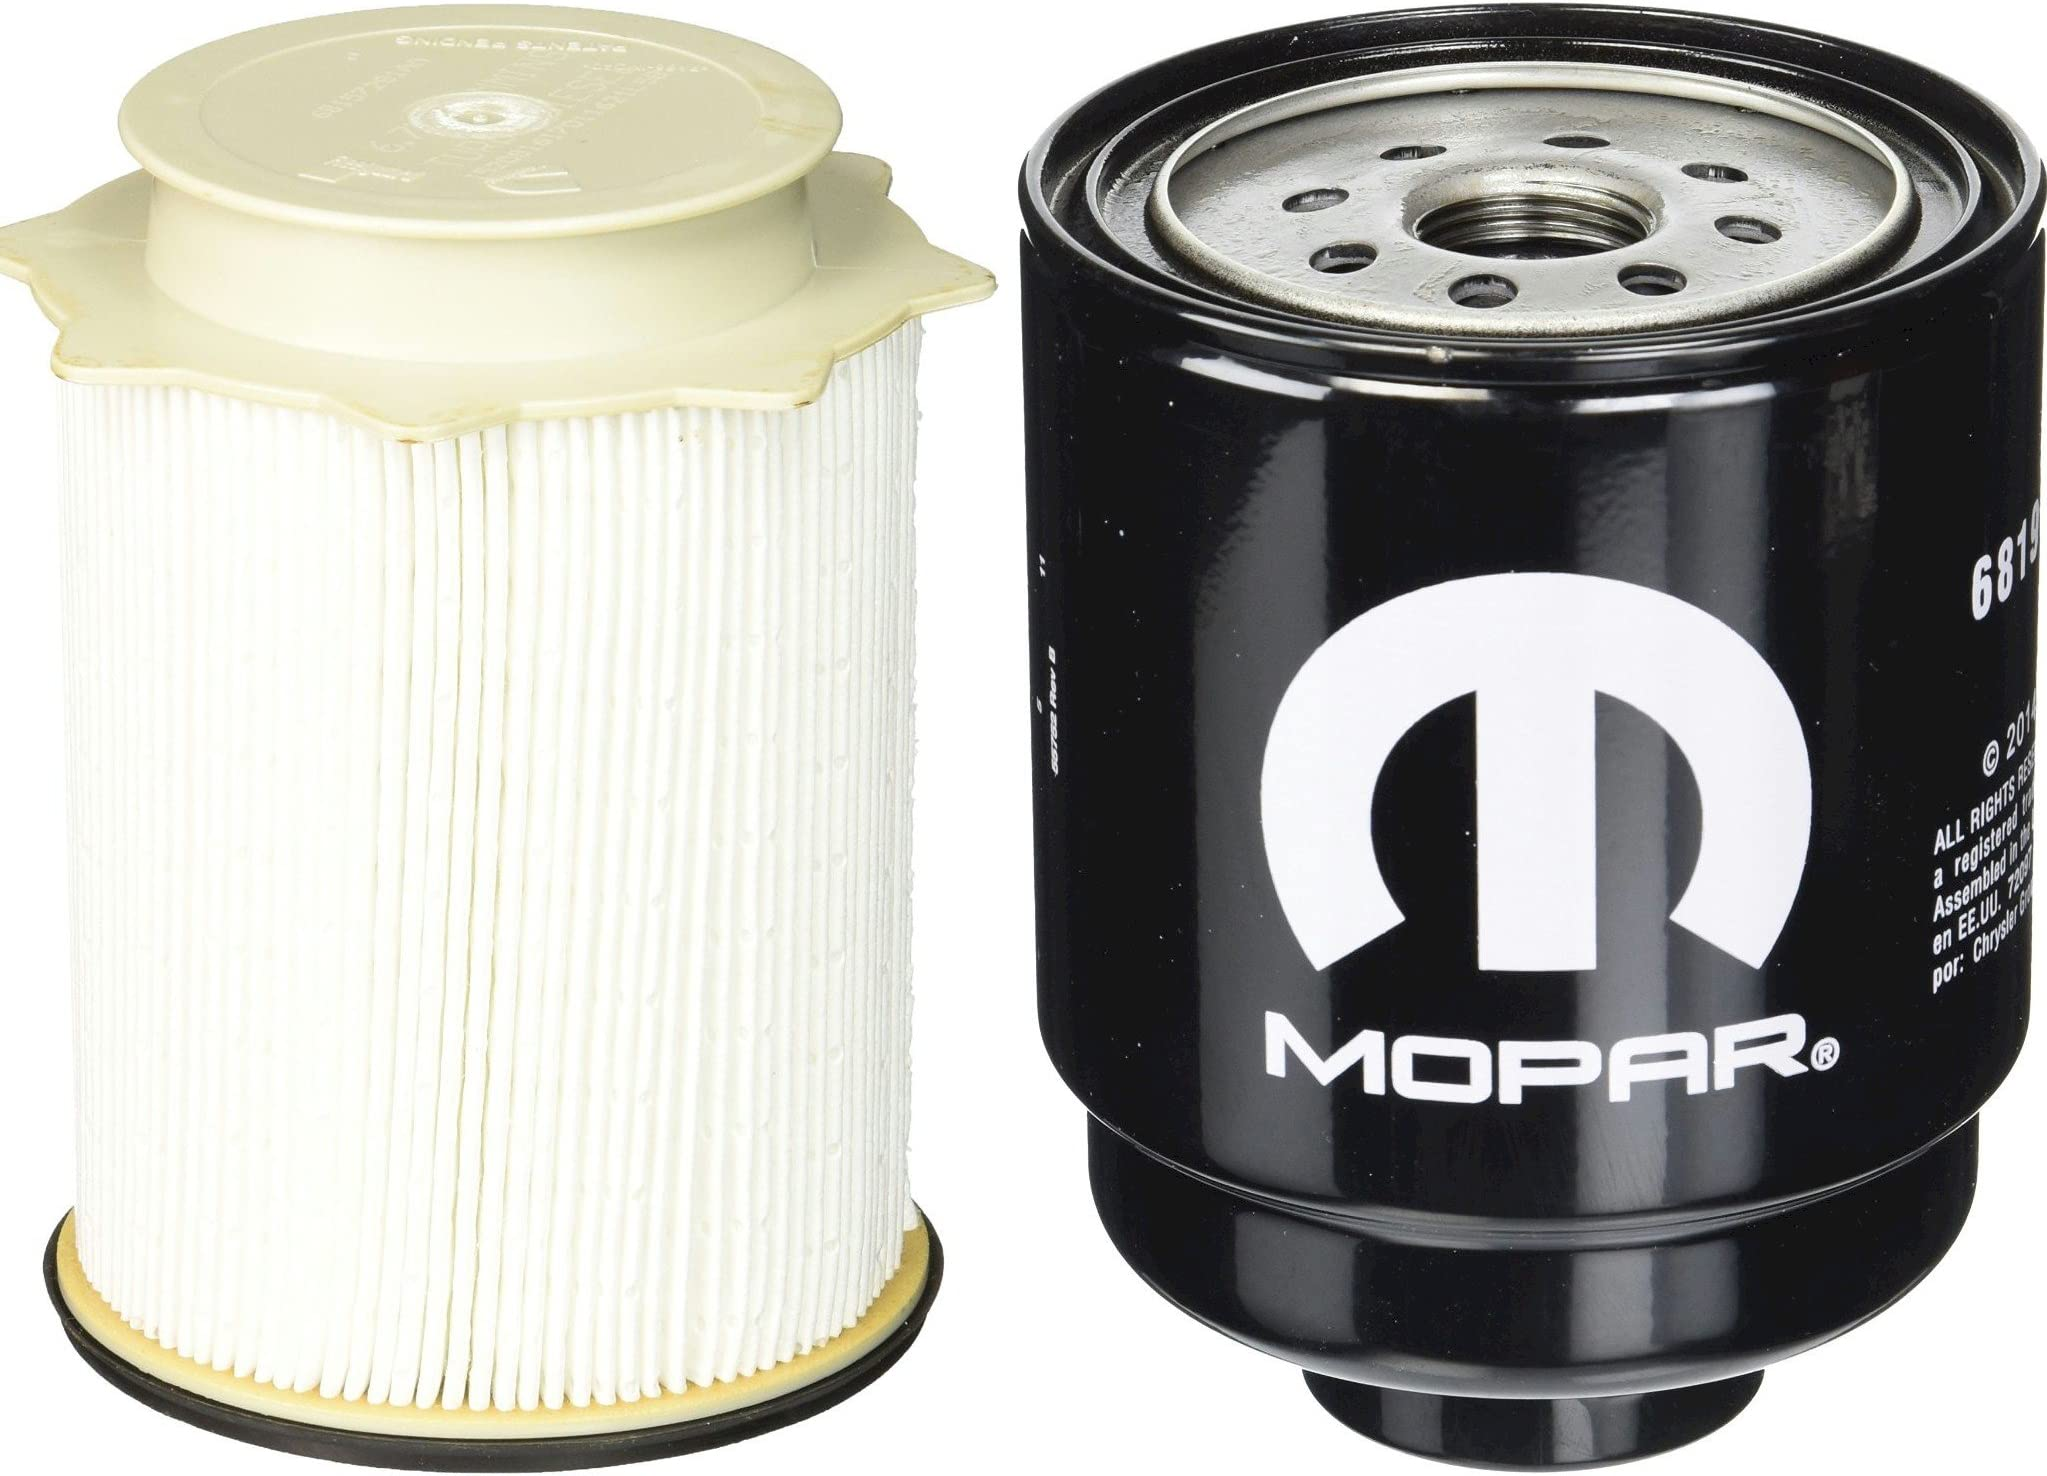 amazon com fuel filters replacement parts automotive 2000 Honda Civic Fuel Filter dodge ram 6 7 liter diesel fuel filter water separator set mopar oem